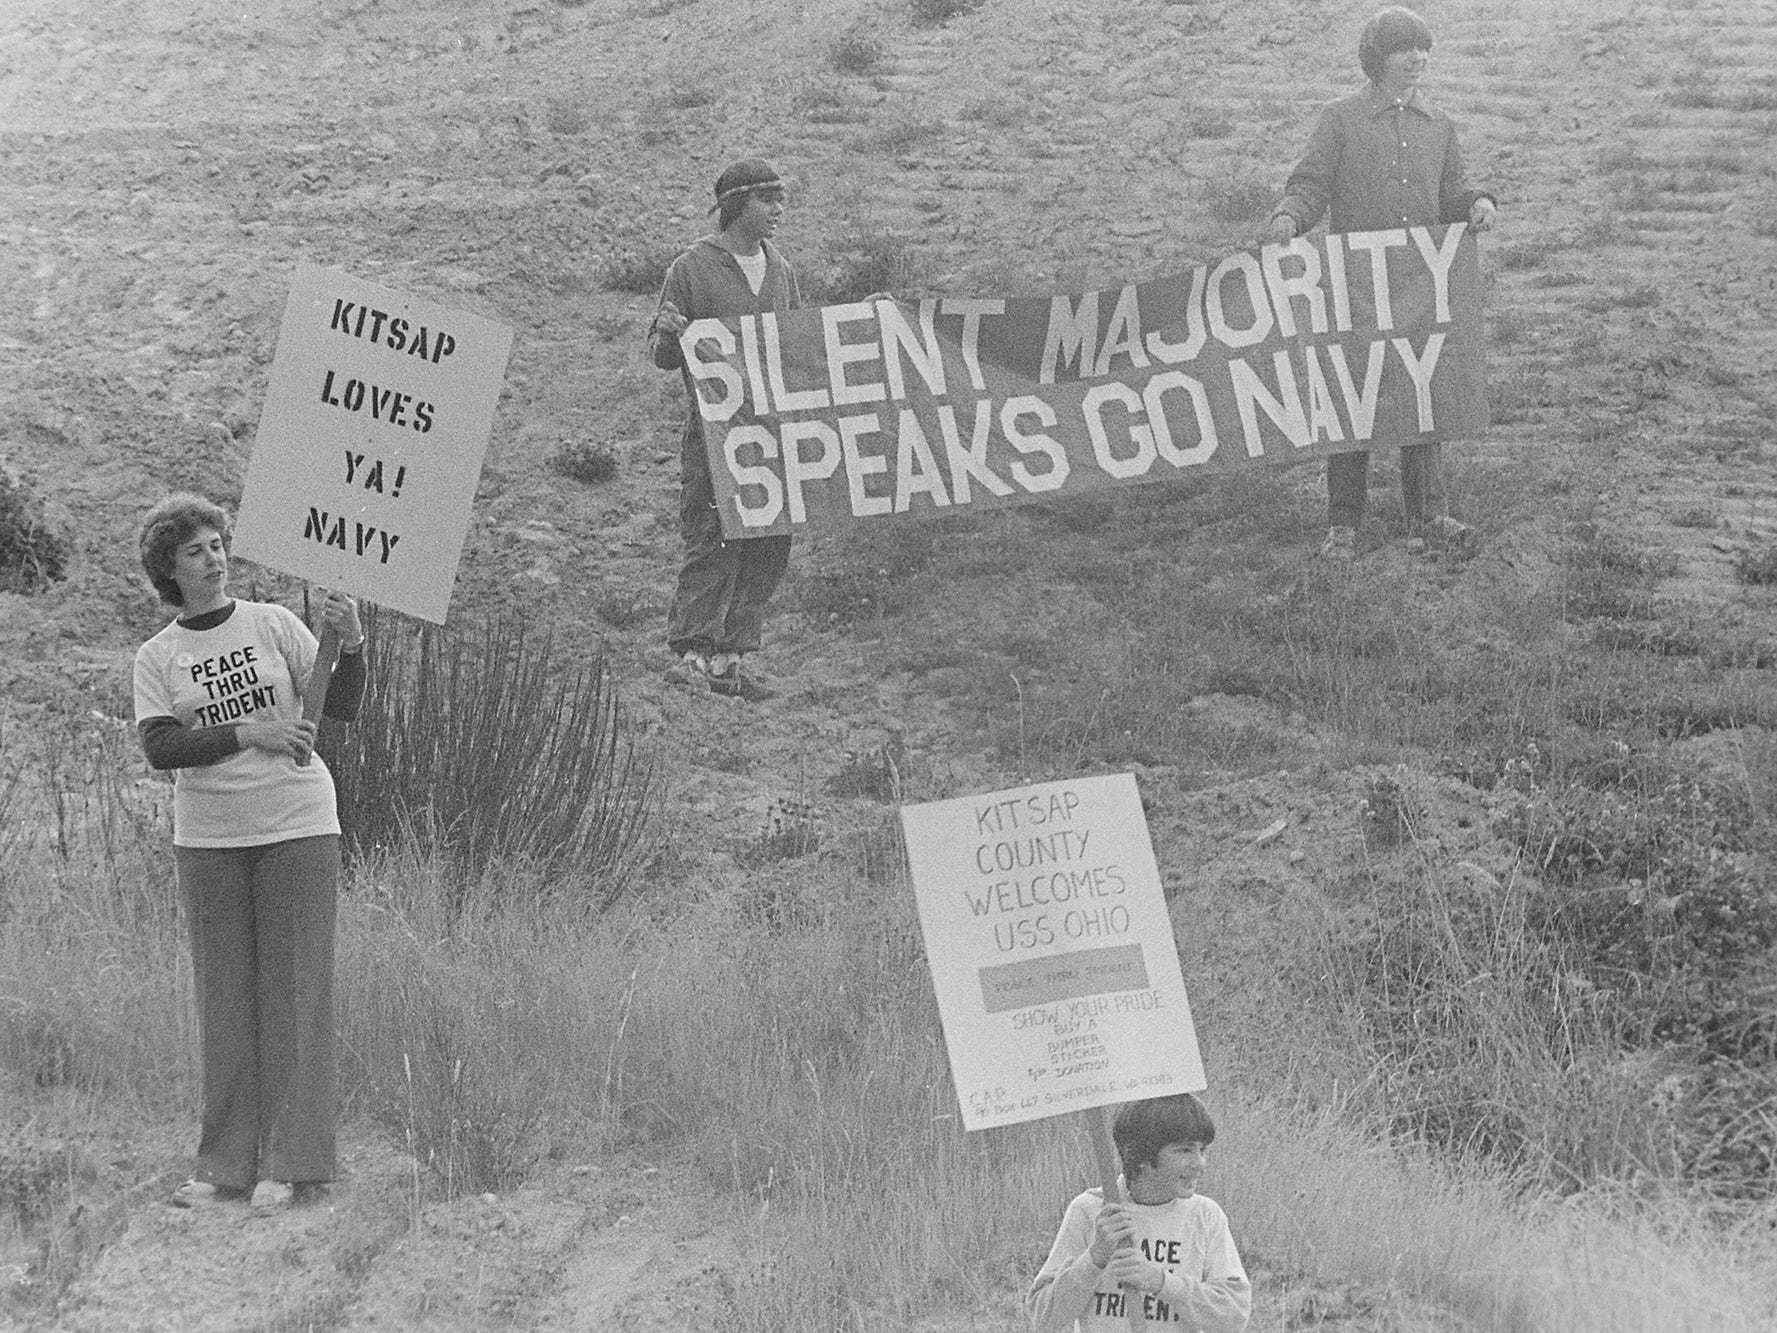 08/05/82Pro Trident Demonstration